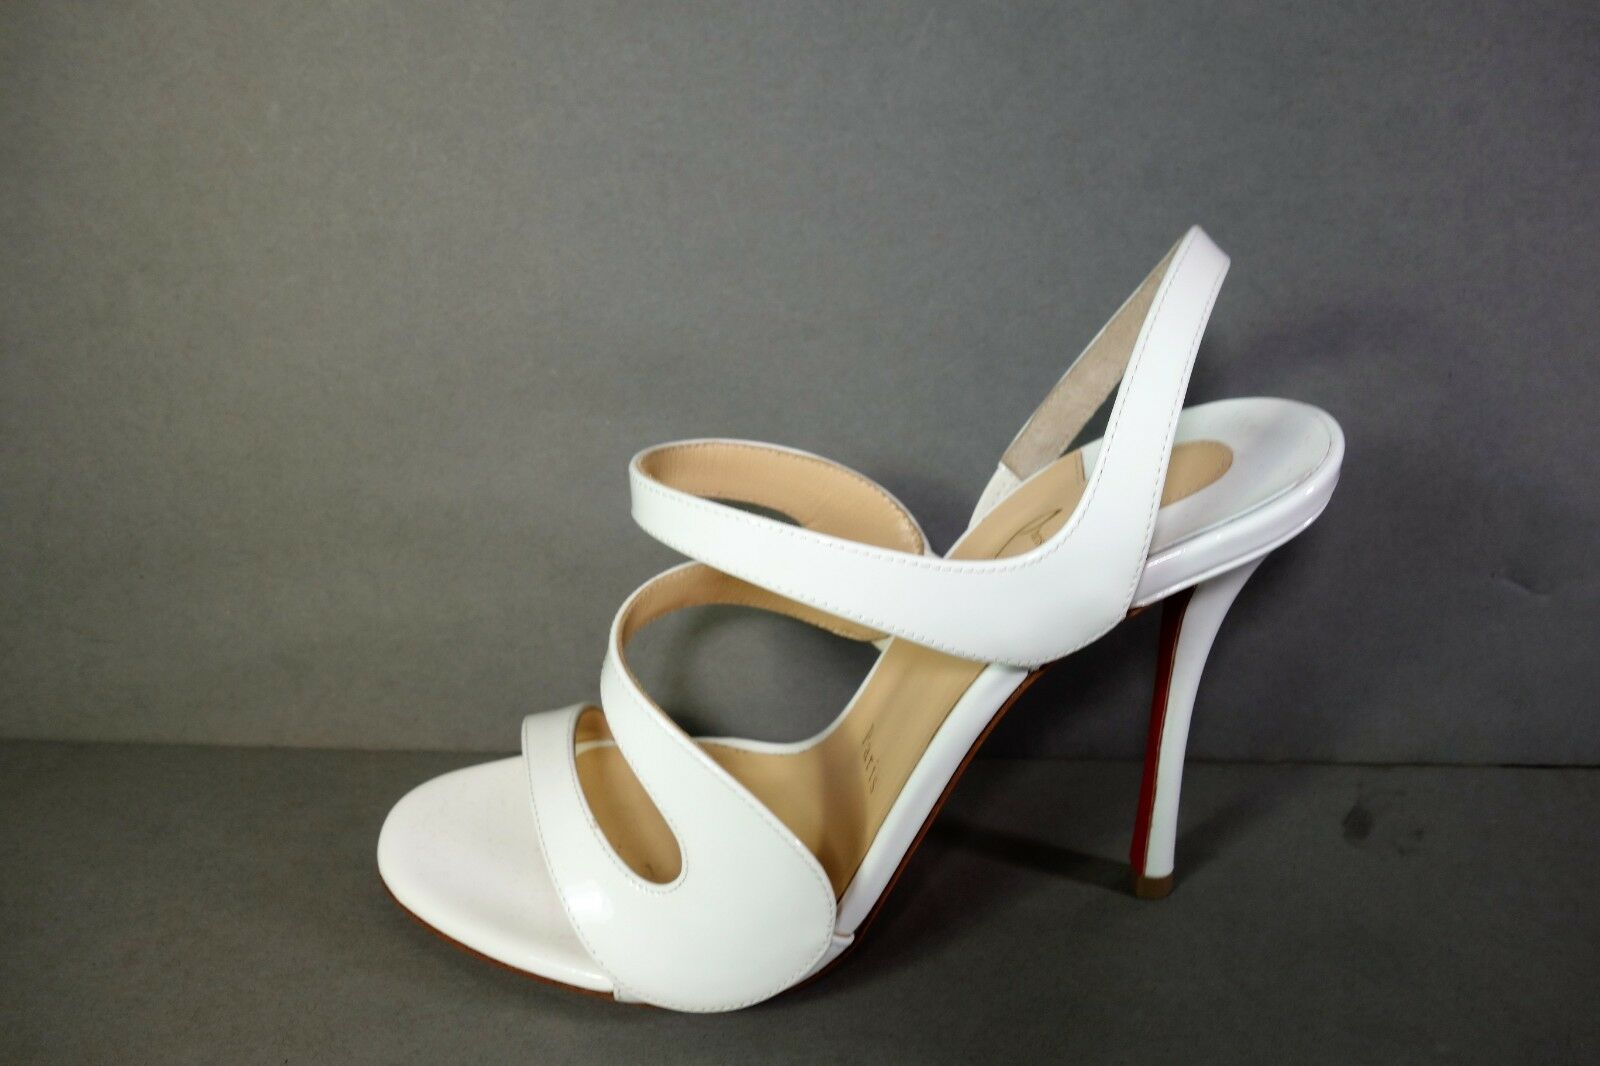 LOUBOUTIN 37 6.5 VAVAZOU 100 White Latte Patent Sandals High High High Heels shoes NEW 2b8db9